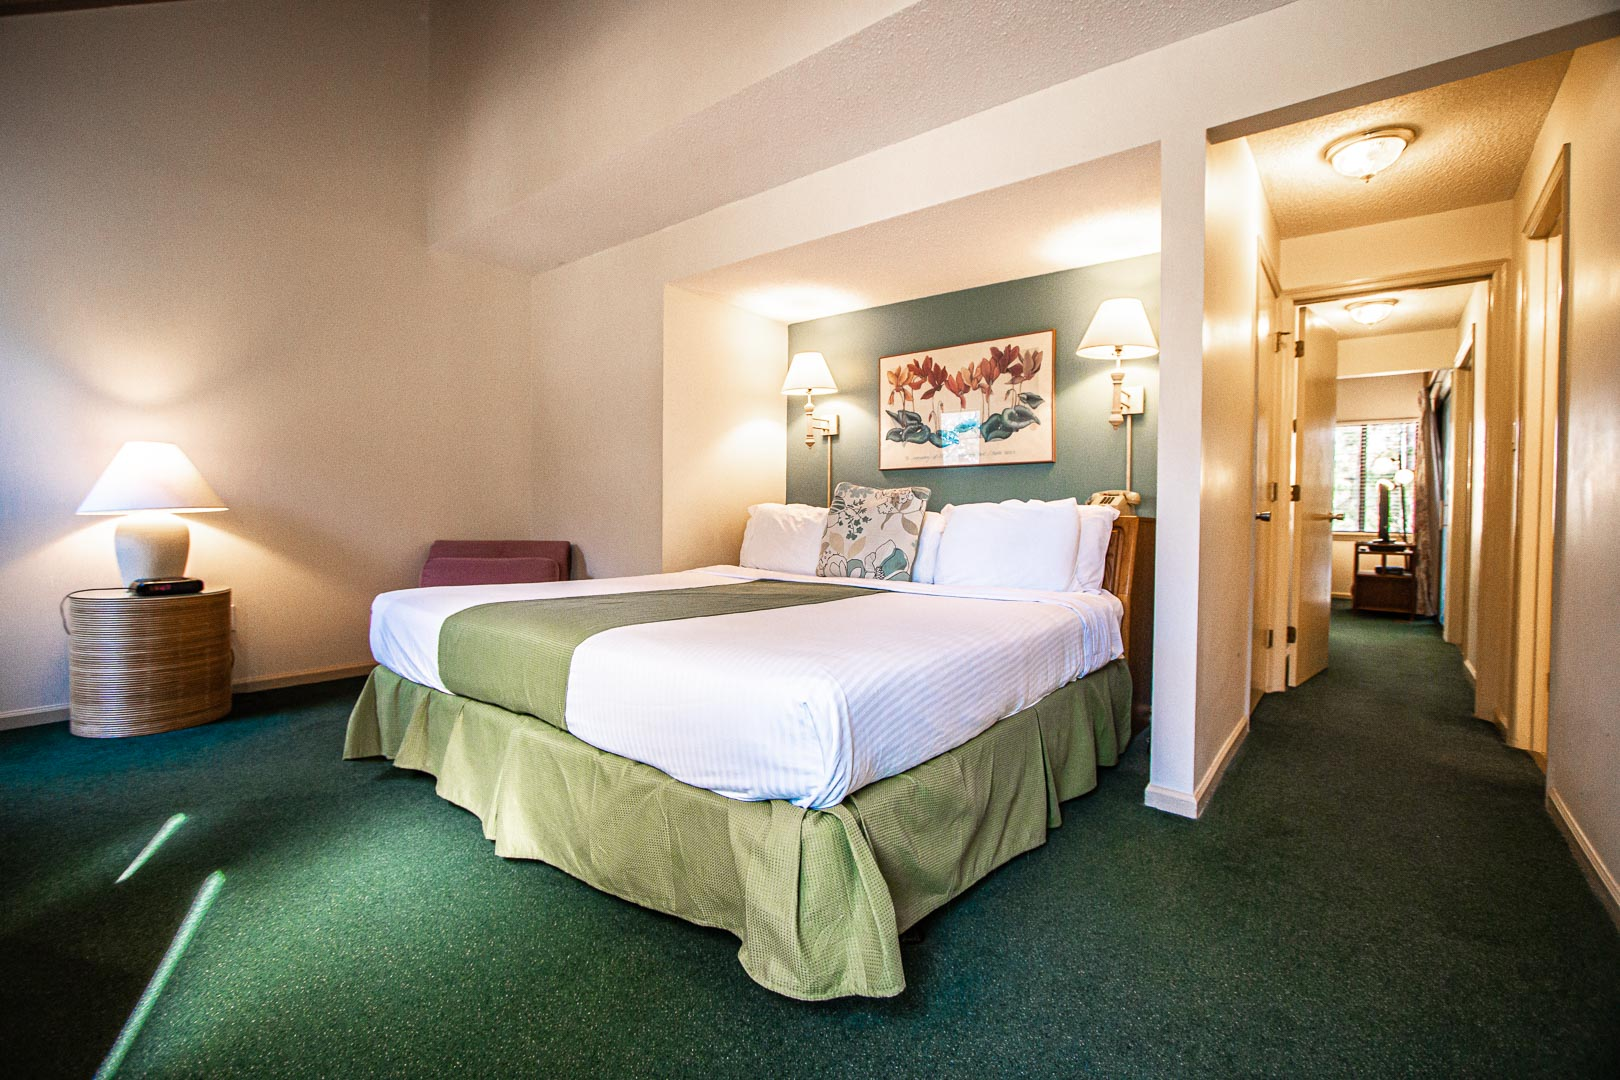 A spacious master bedroom at VRI's Sandcastle Cove in New Bern, North Carolina.